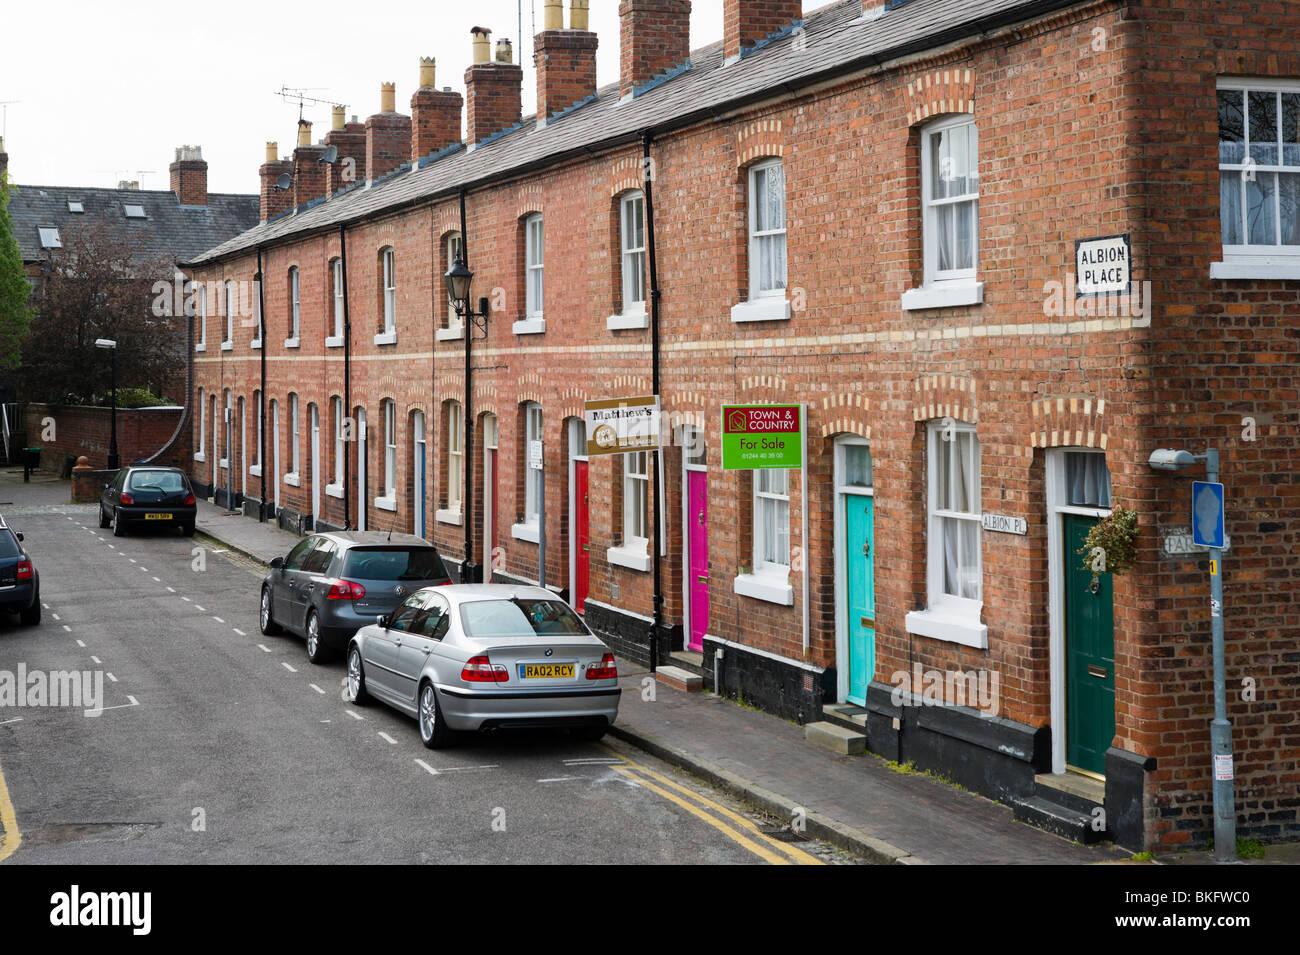 Casas adosadas, Chester, Cheshire, Inglaterra, Reino Unido. Imagen De Stock